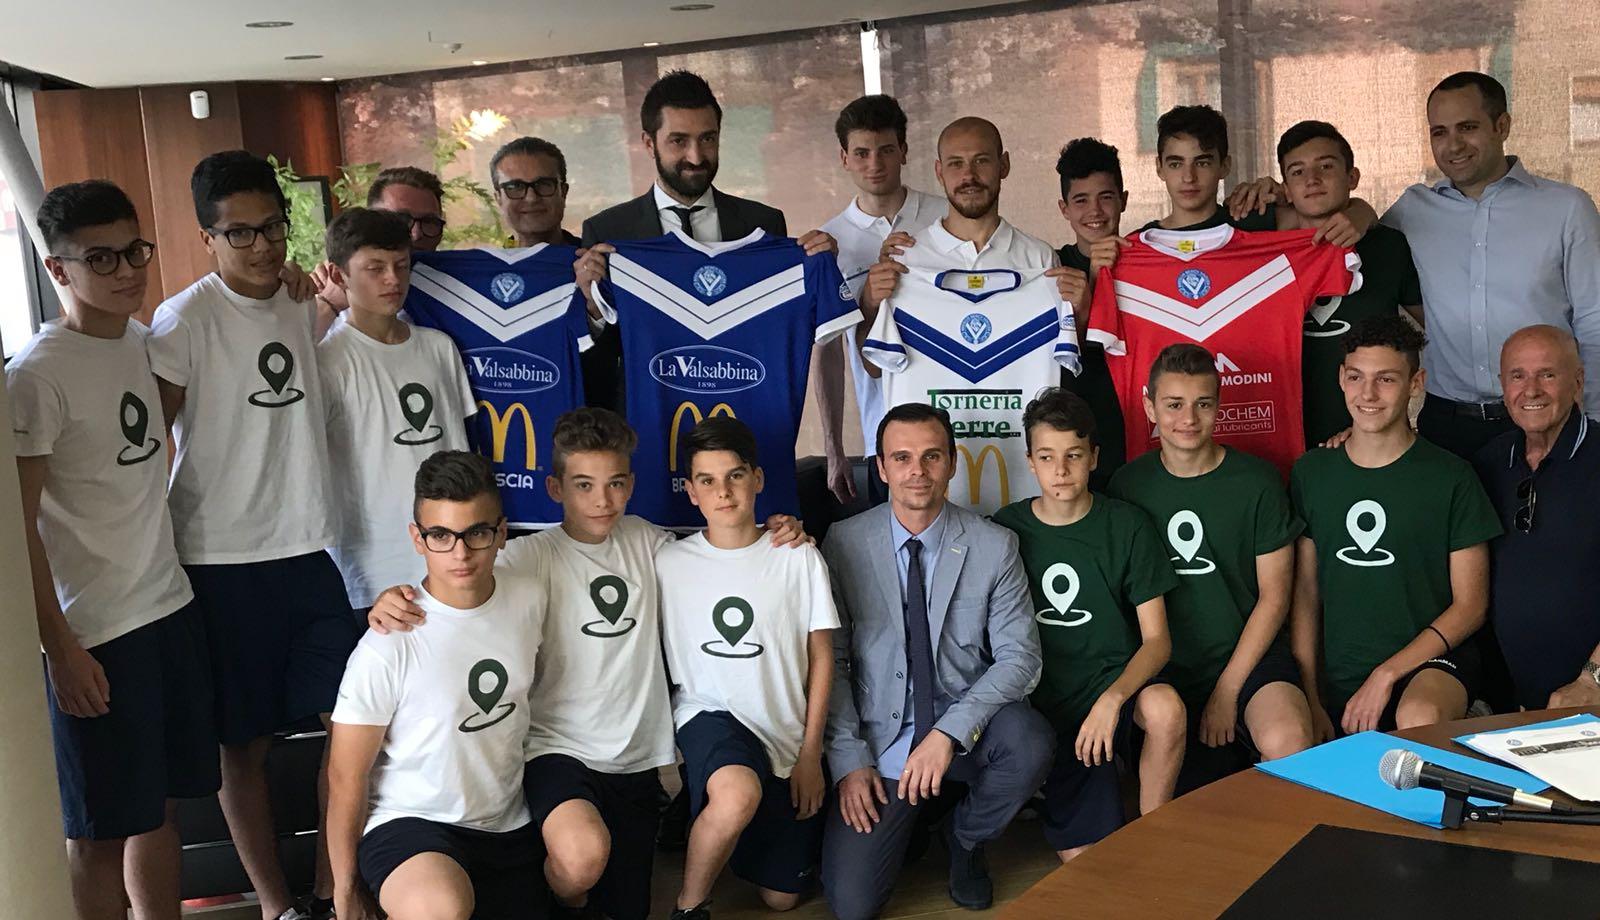 brescia beach soccer 2018 conferenza stampa   Banca Valsabbina